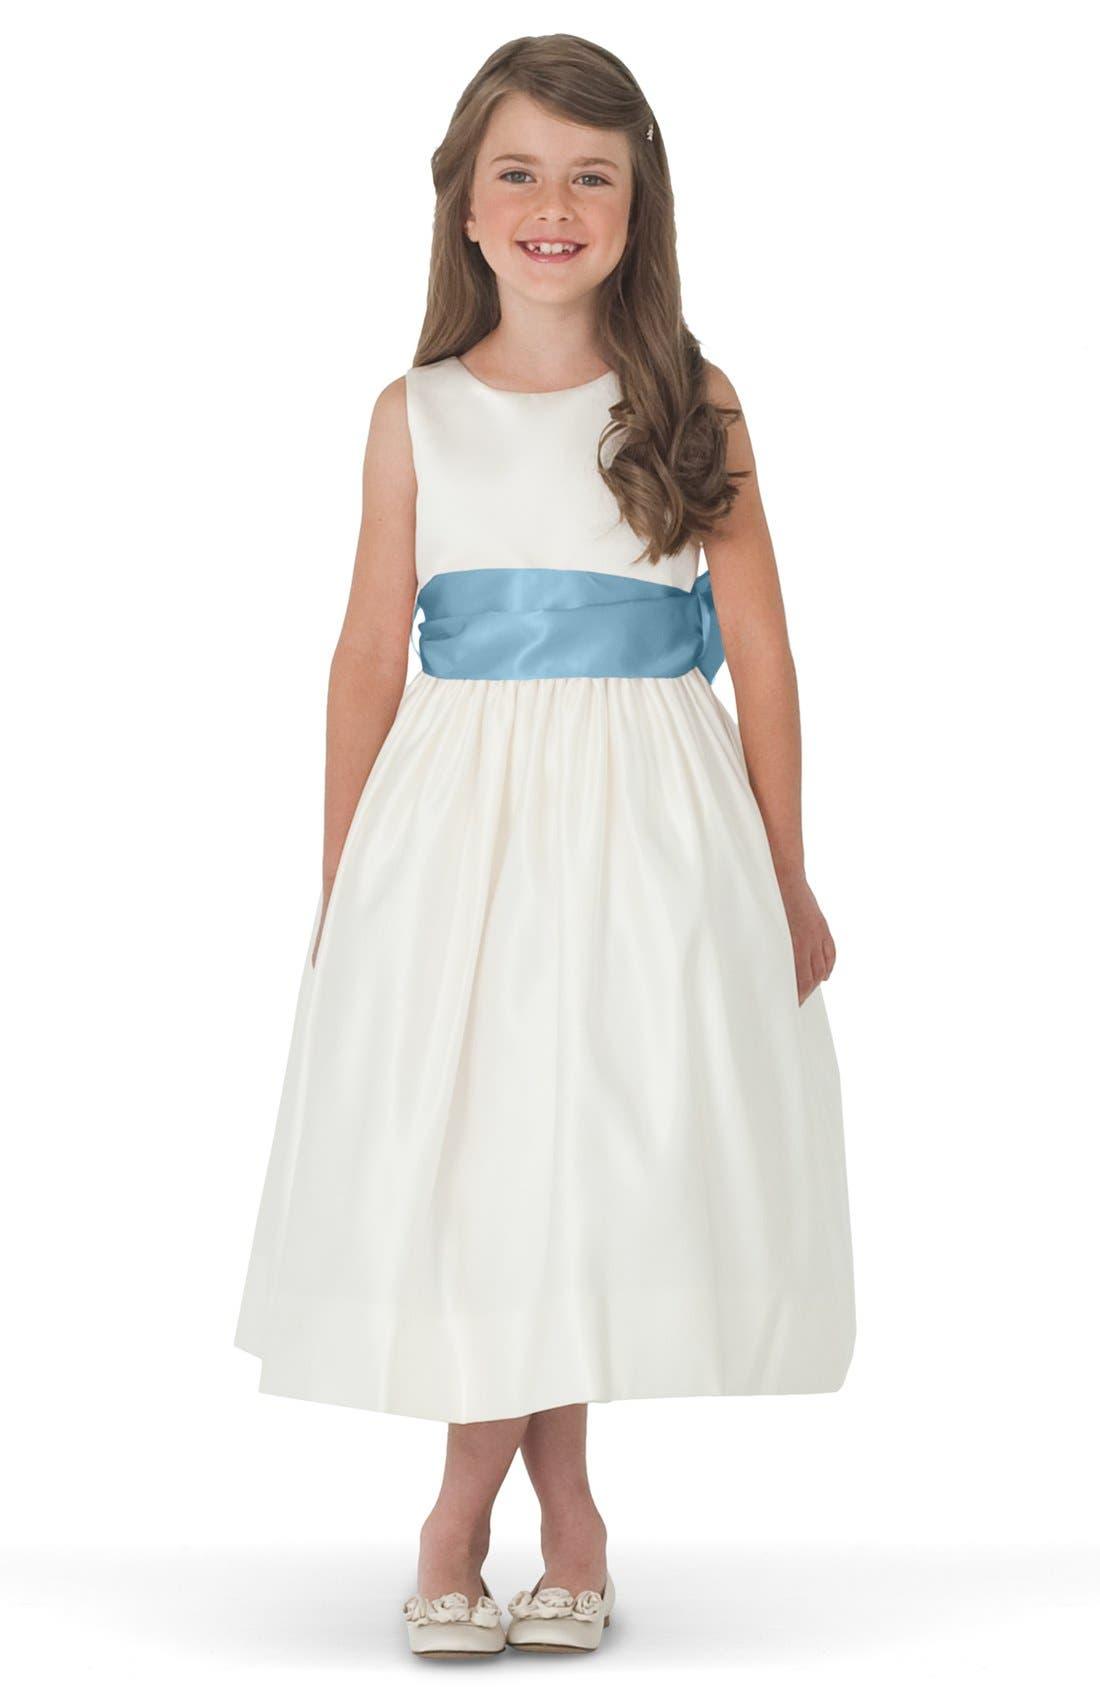 US ANGELS Sleeveless Satin Dress with Contrast Sash, Main, color, Ivory/ capri